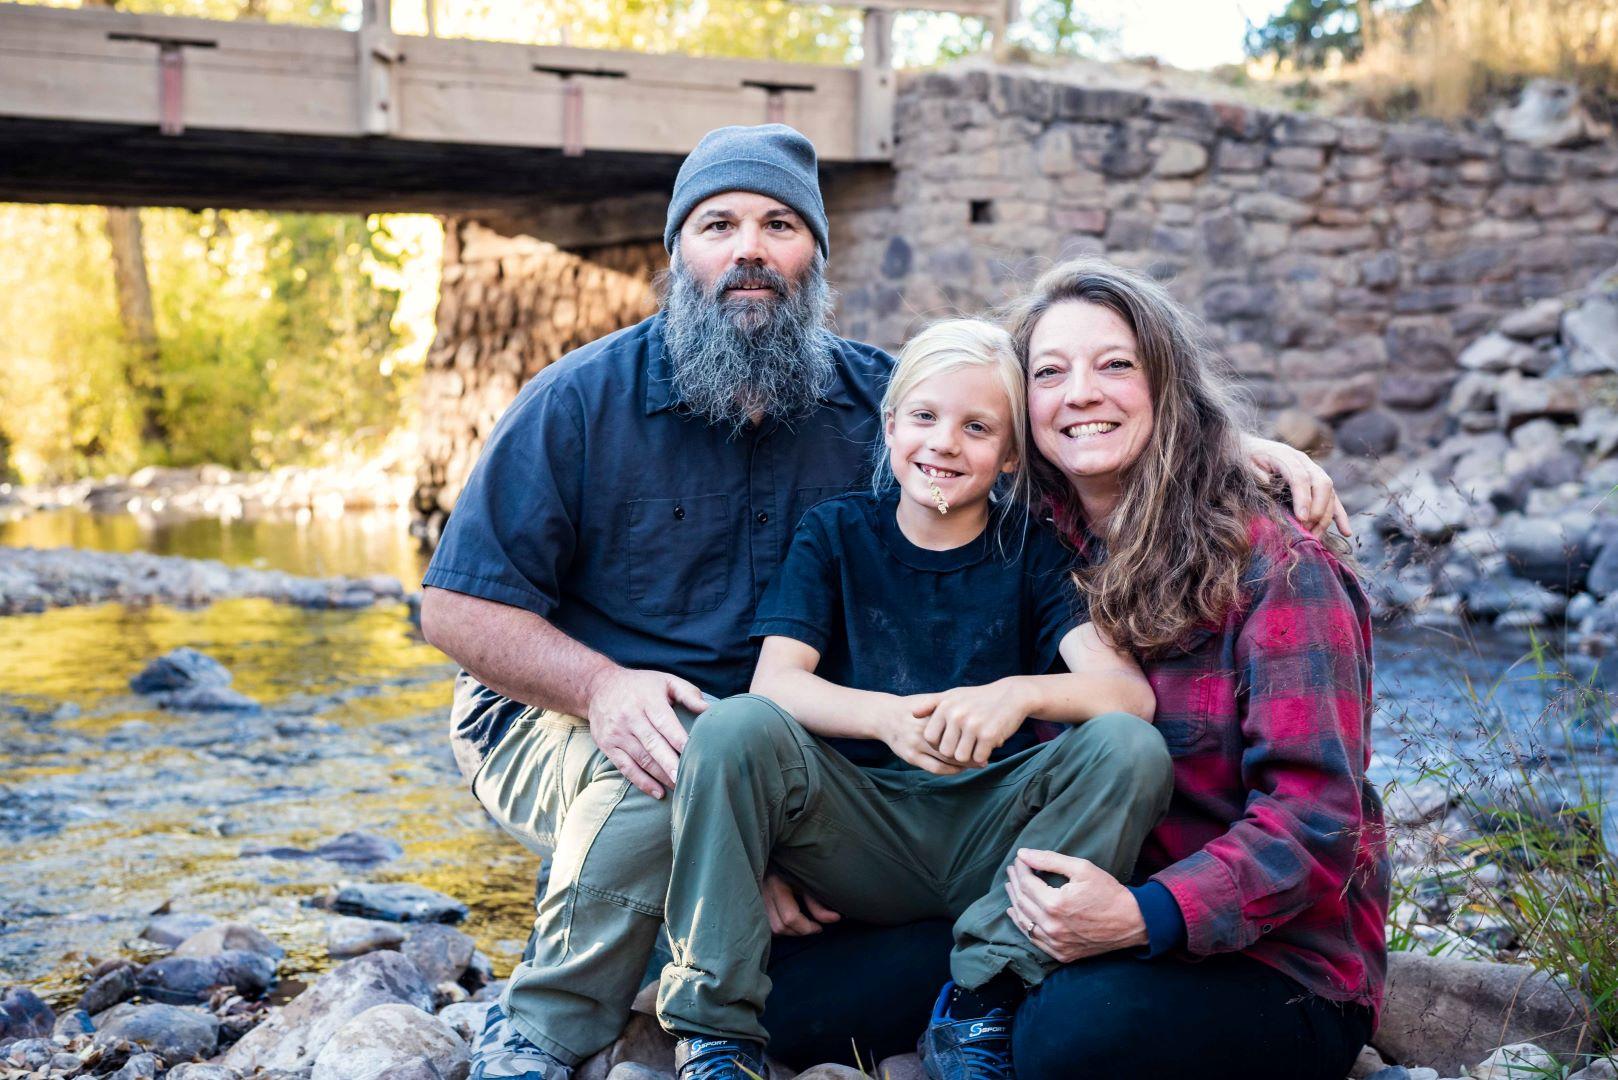 neilson family photography utah weber canyon wilderness outdoor bridge river